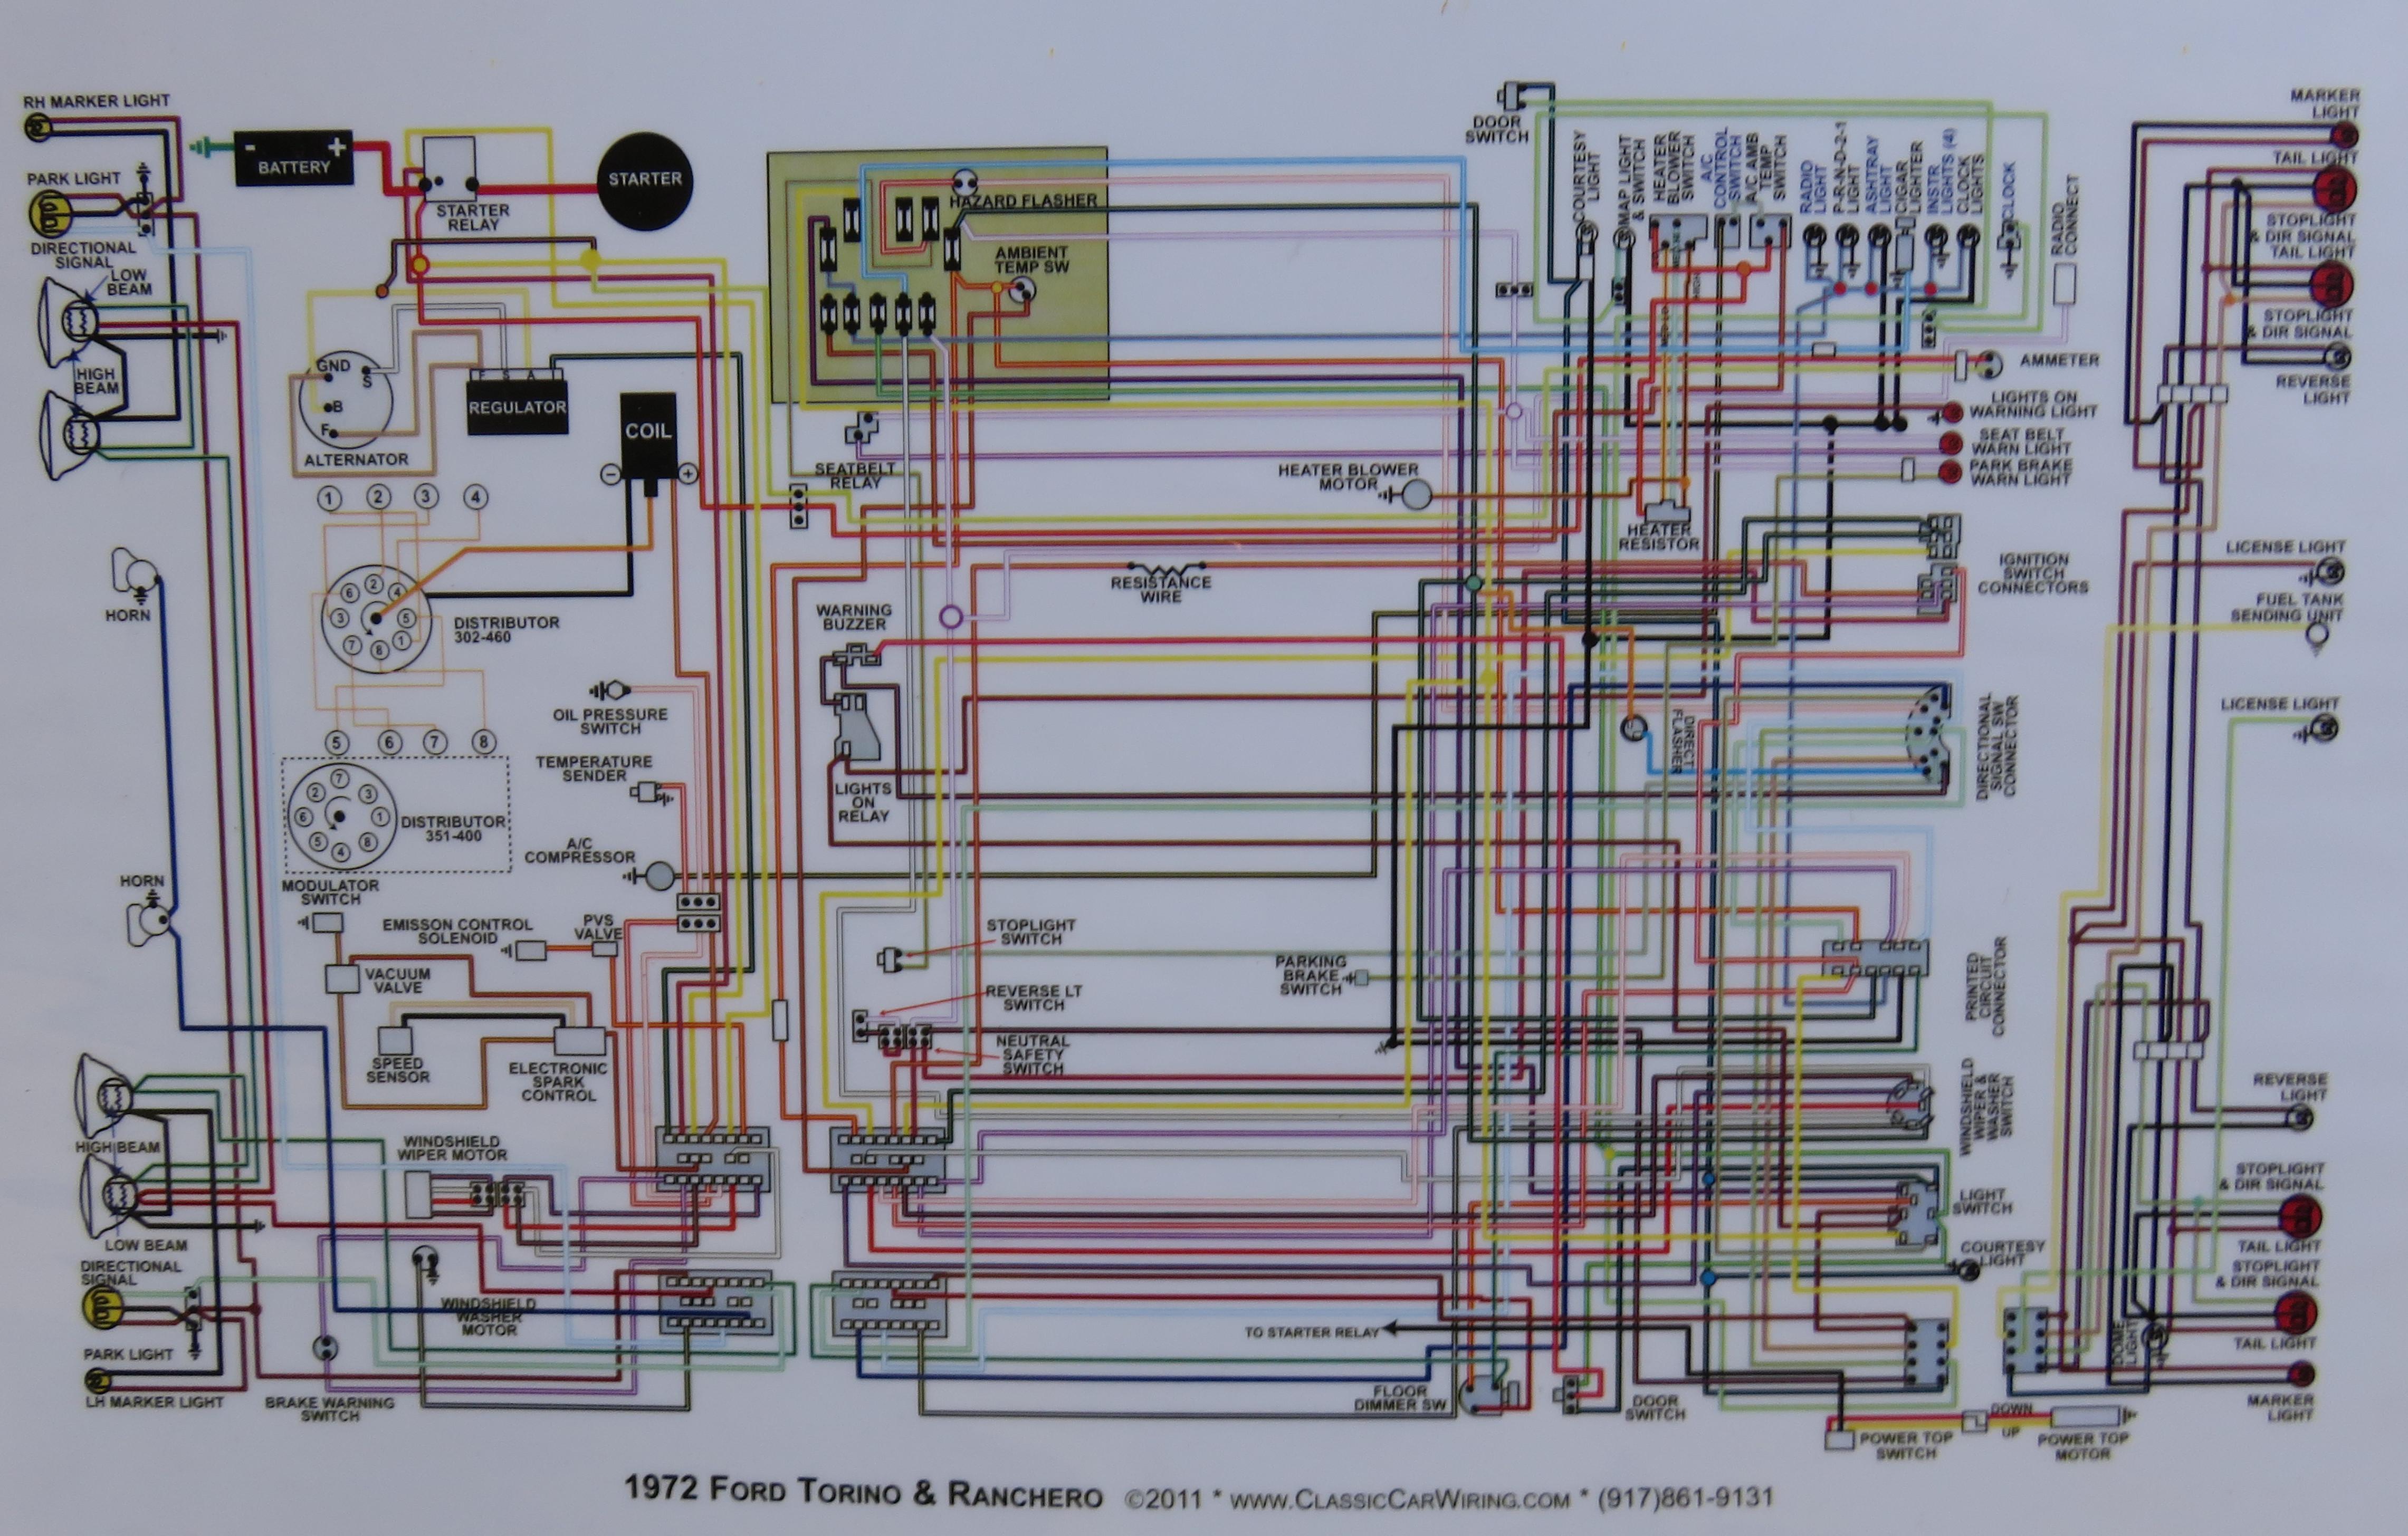 [DIAGRAM_1JK]  AX_4339] 9200I International Truck Wiring Diagram Wiring Diagram | Wiring Diagram International 9100i |  | Salv Neph Tron Apan Egre Wigeg Teria Xaem Ical Licuk Carn Rious Sand Lukep  Oxyt Rmine Shopa Mohammedshrine Librar Wiring 101